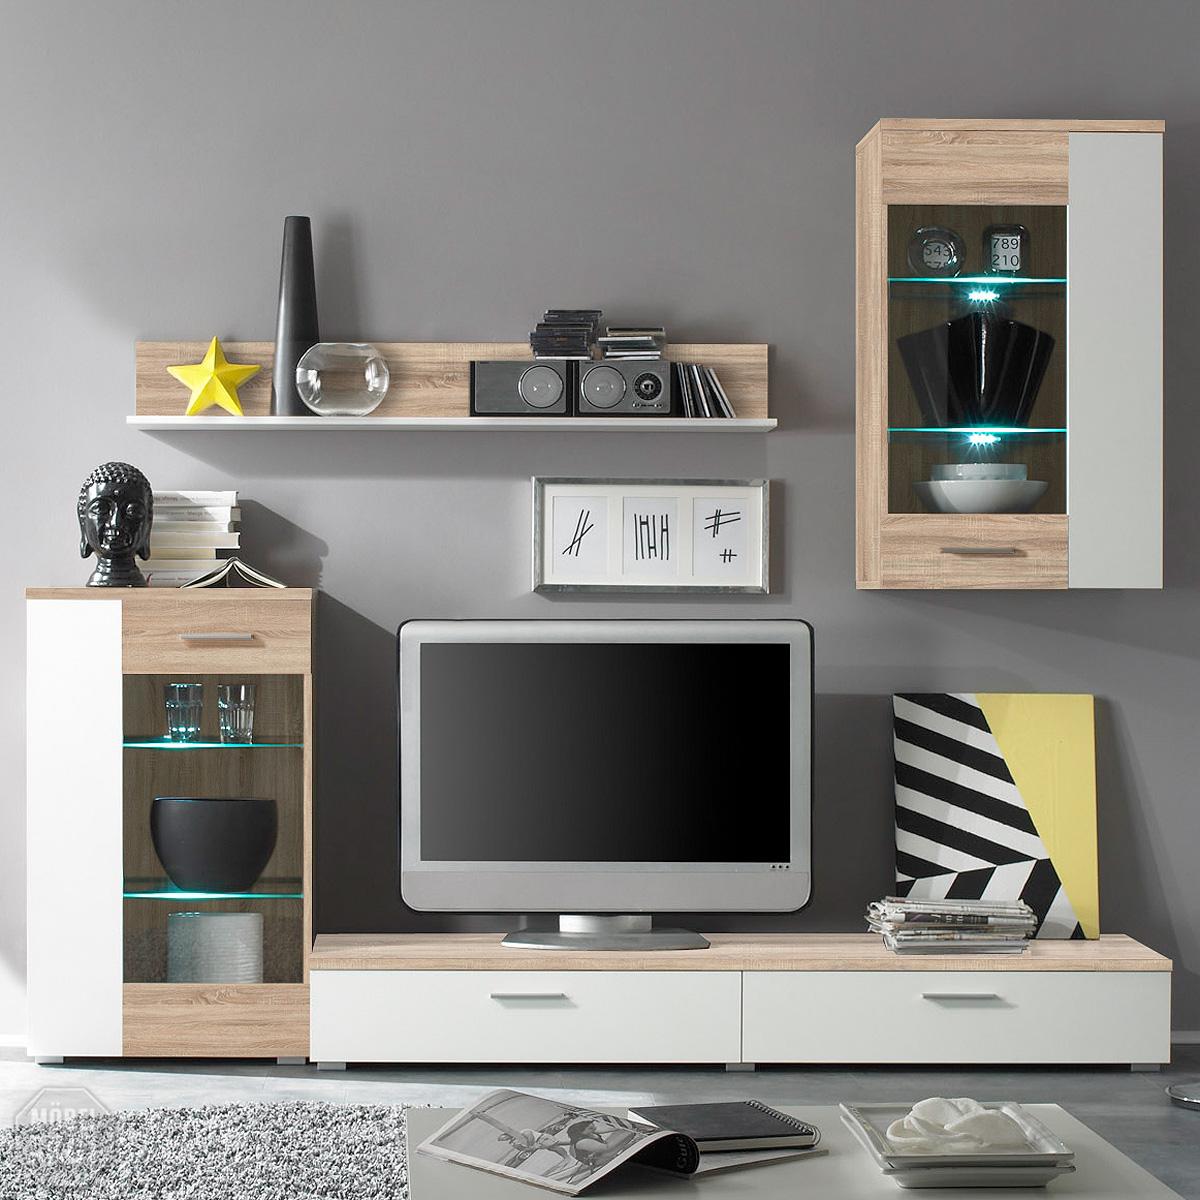 wohnwand cat anbauwand sonoma eiche wei inkl led neu. Black Bedroom Furniture Sets. Home Design Ideas